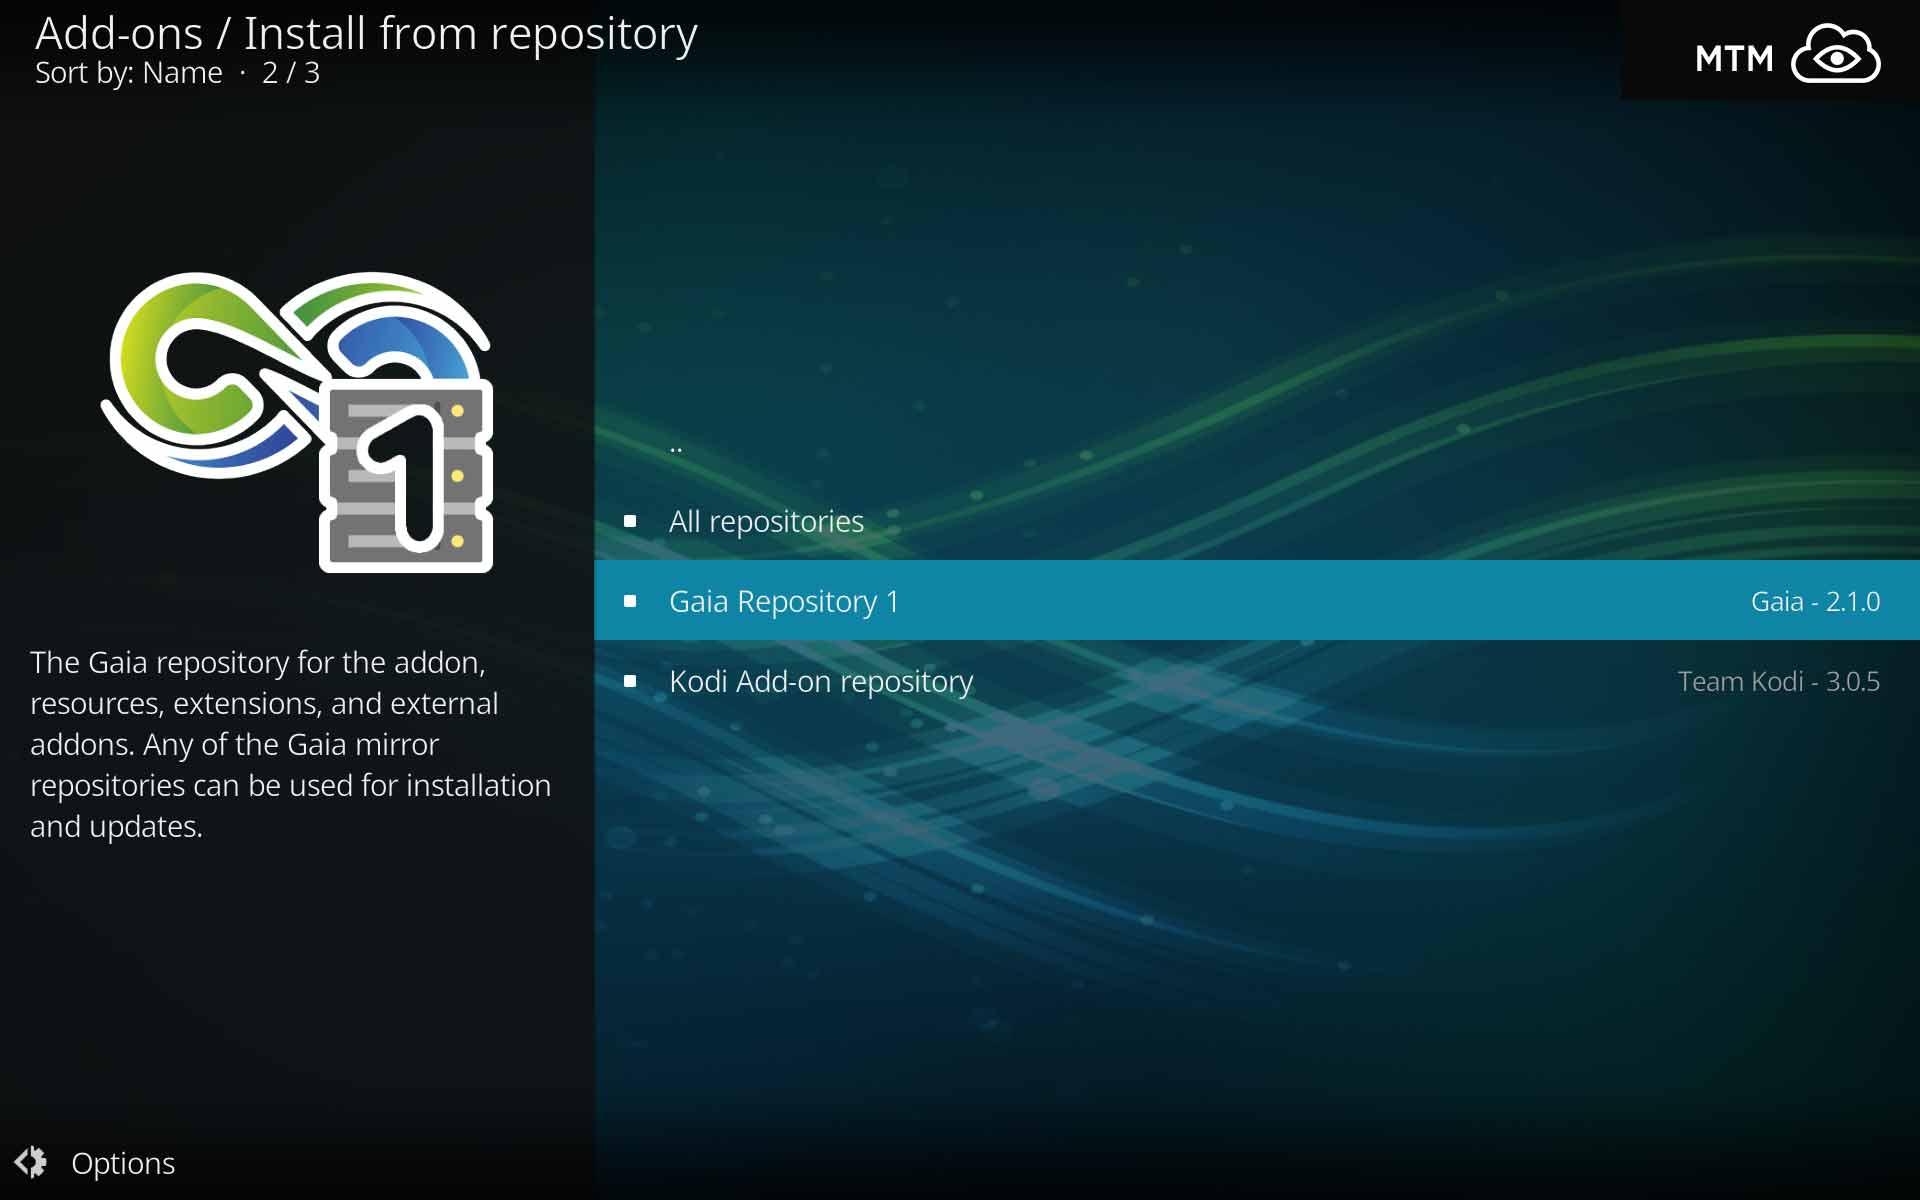 Install GAIA Kodi Torrent Video Streaming Addon [WORKS GREAT!]